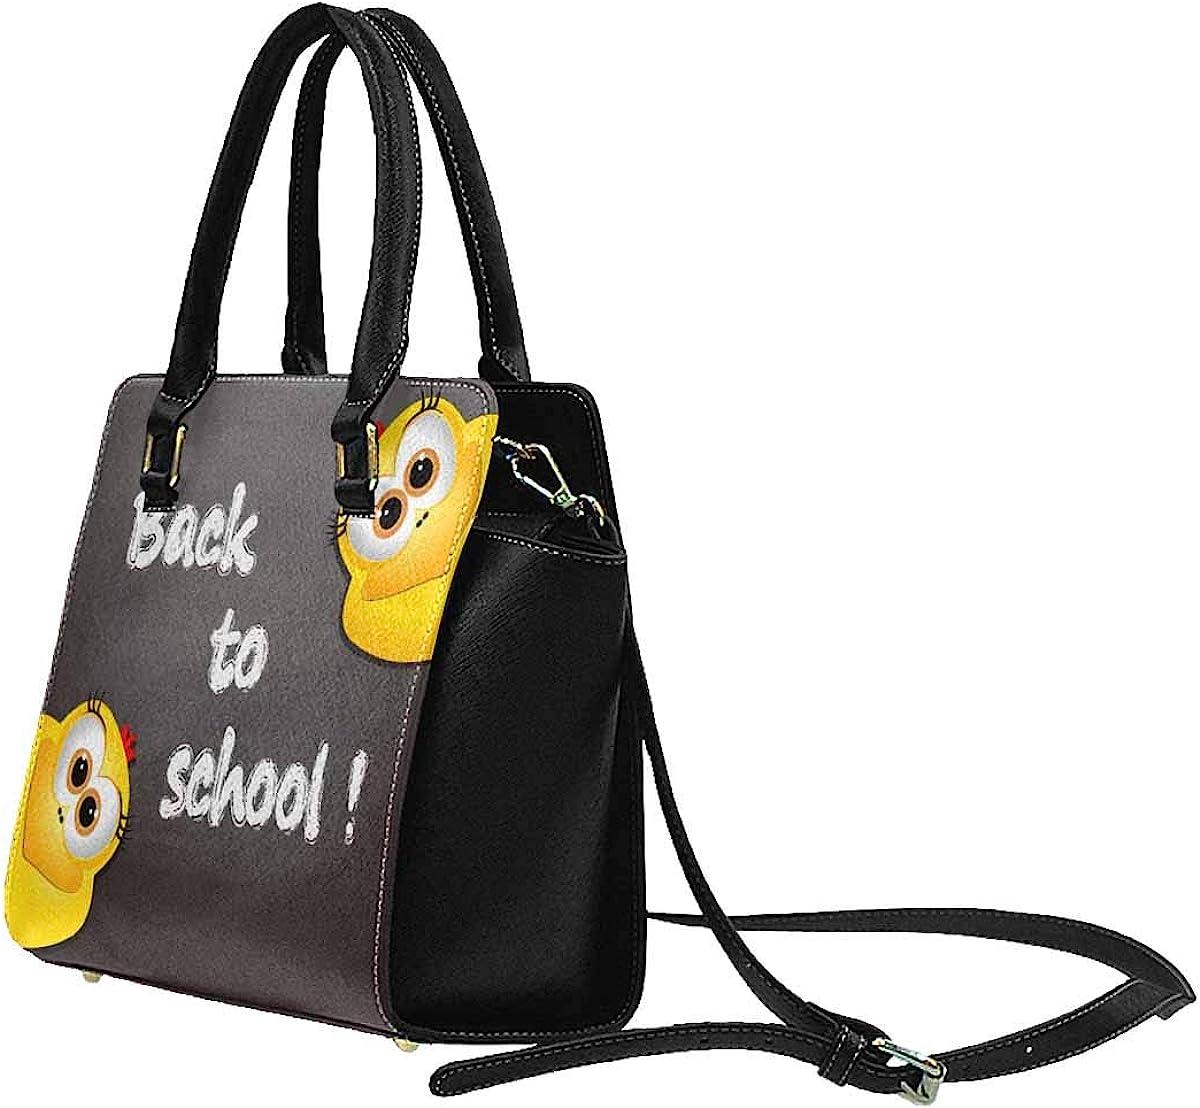 INTERESTPRINT Funny Chickens Bags Top Handle Handbags Tote Bag